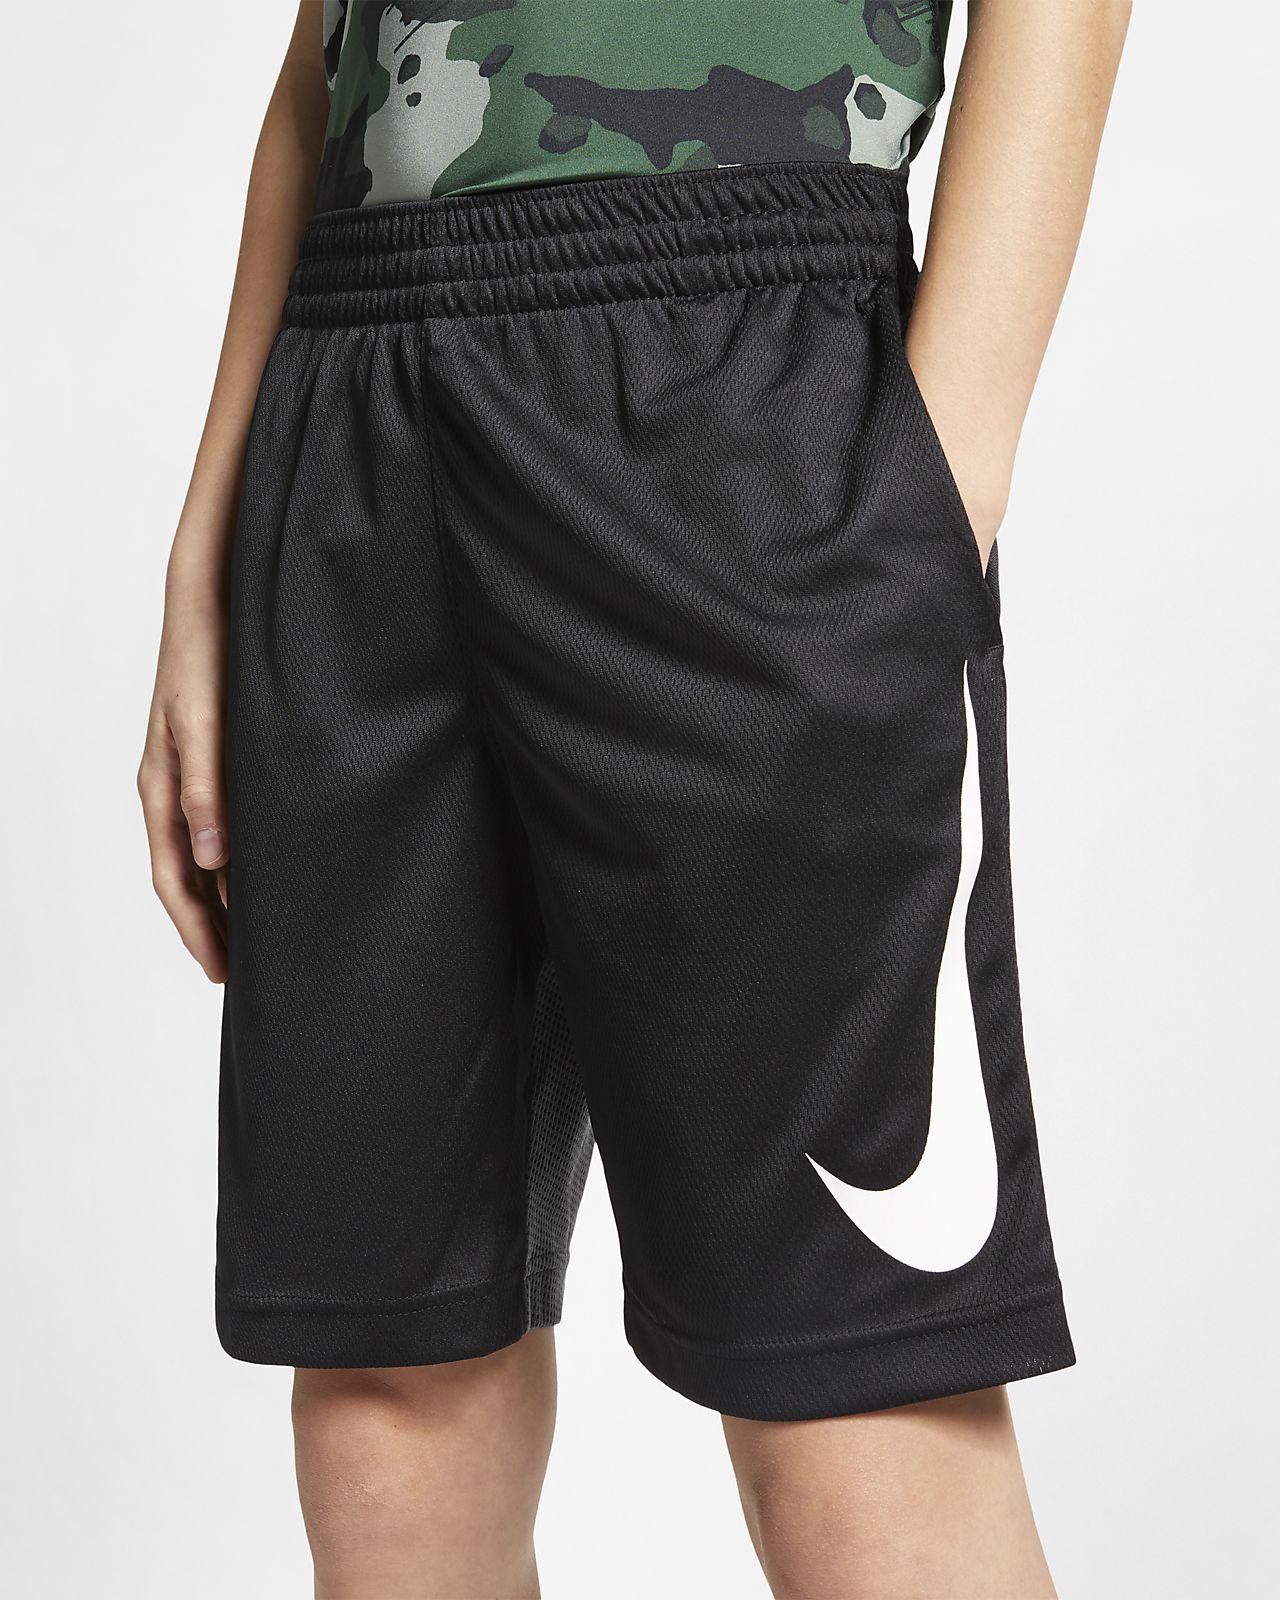 Older Kids' (Boys') Basketball Shorts Nike Dri-FIT £8.60 Delivered From Nike